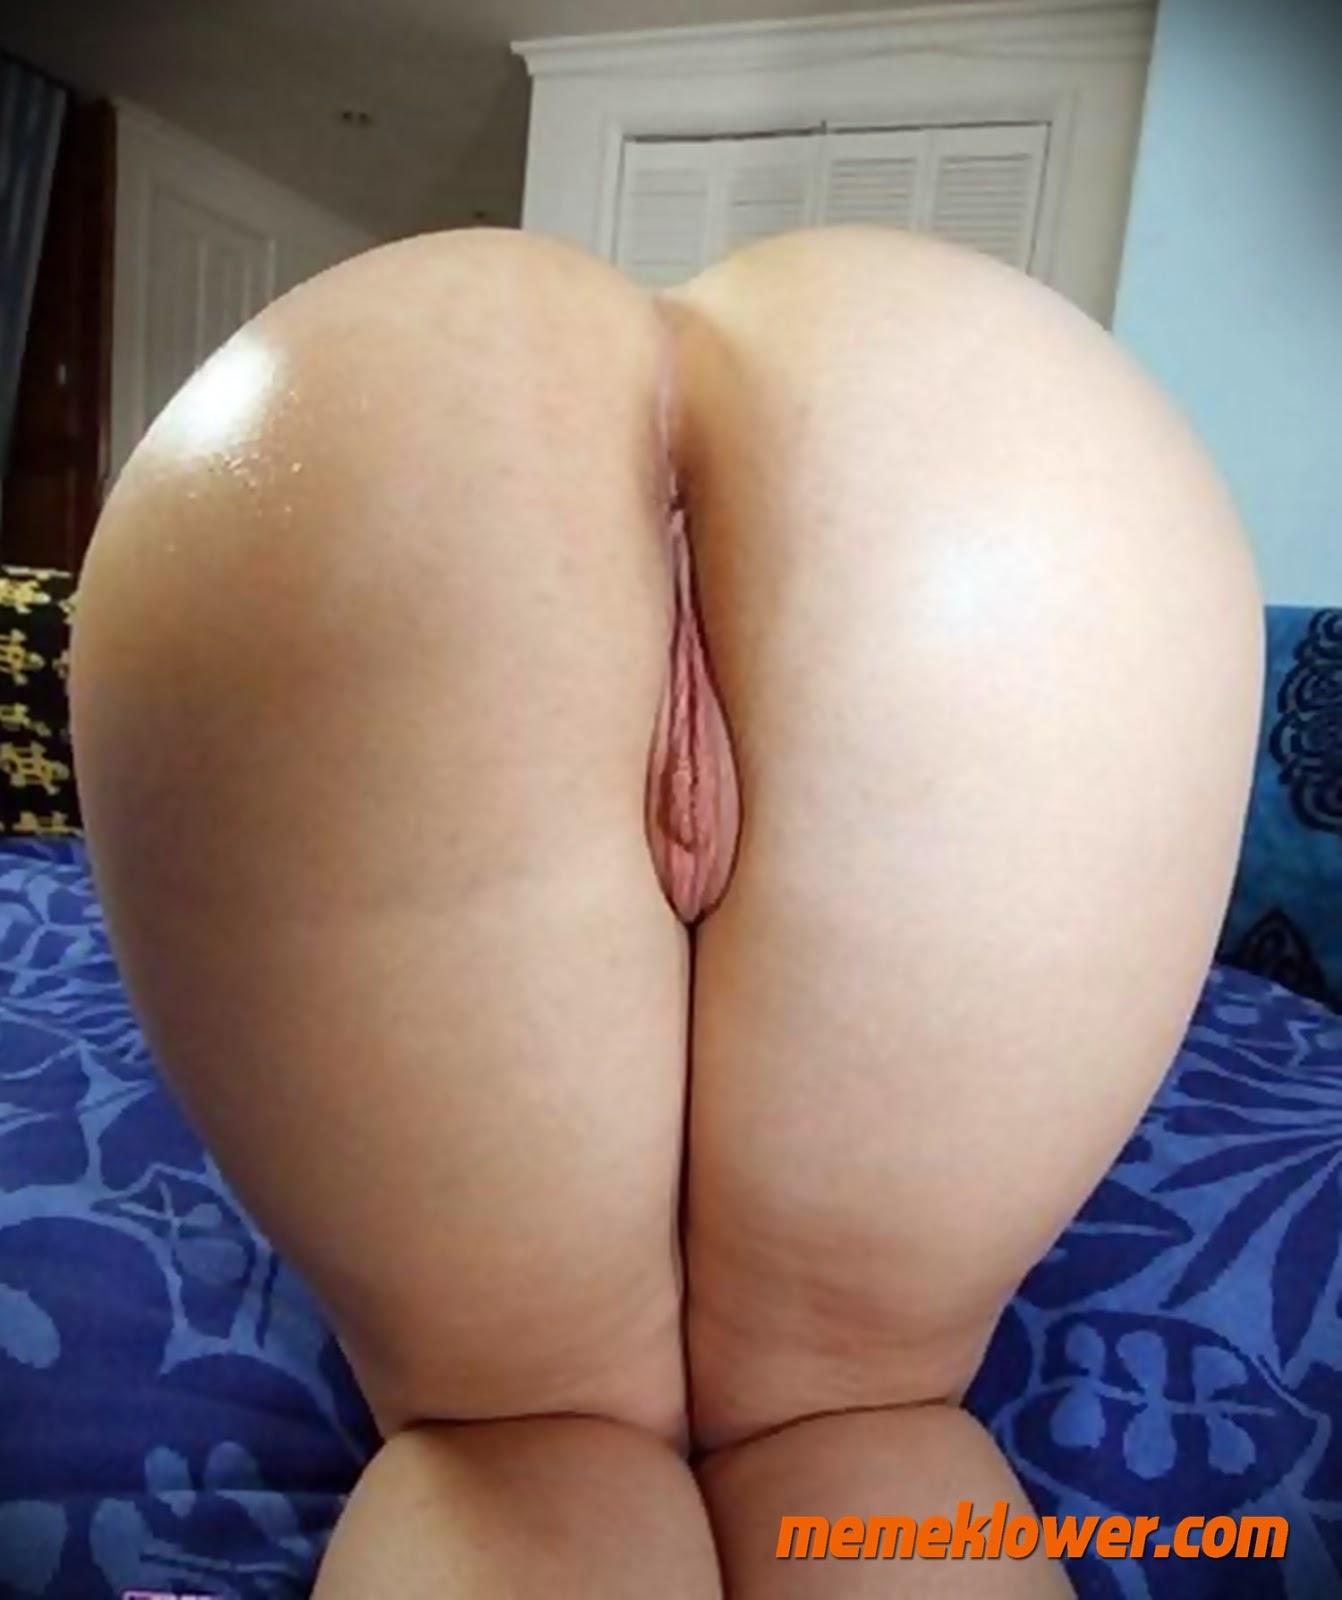 foto-bugil-tante-cantik-jilbab-bokong-besar-3